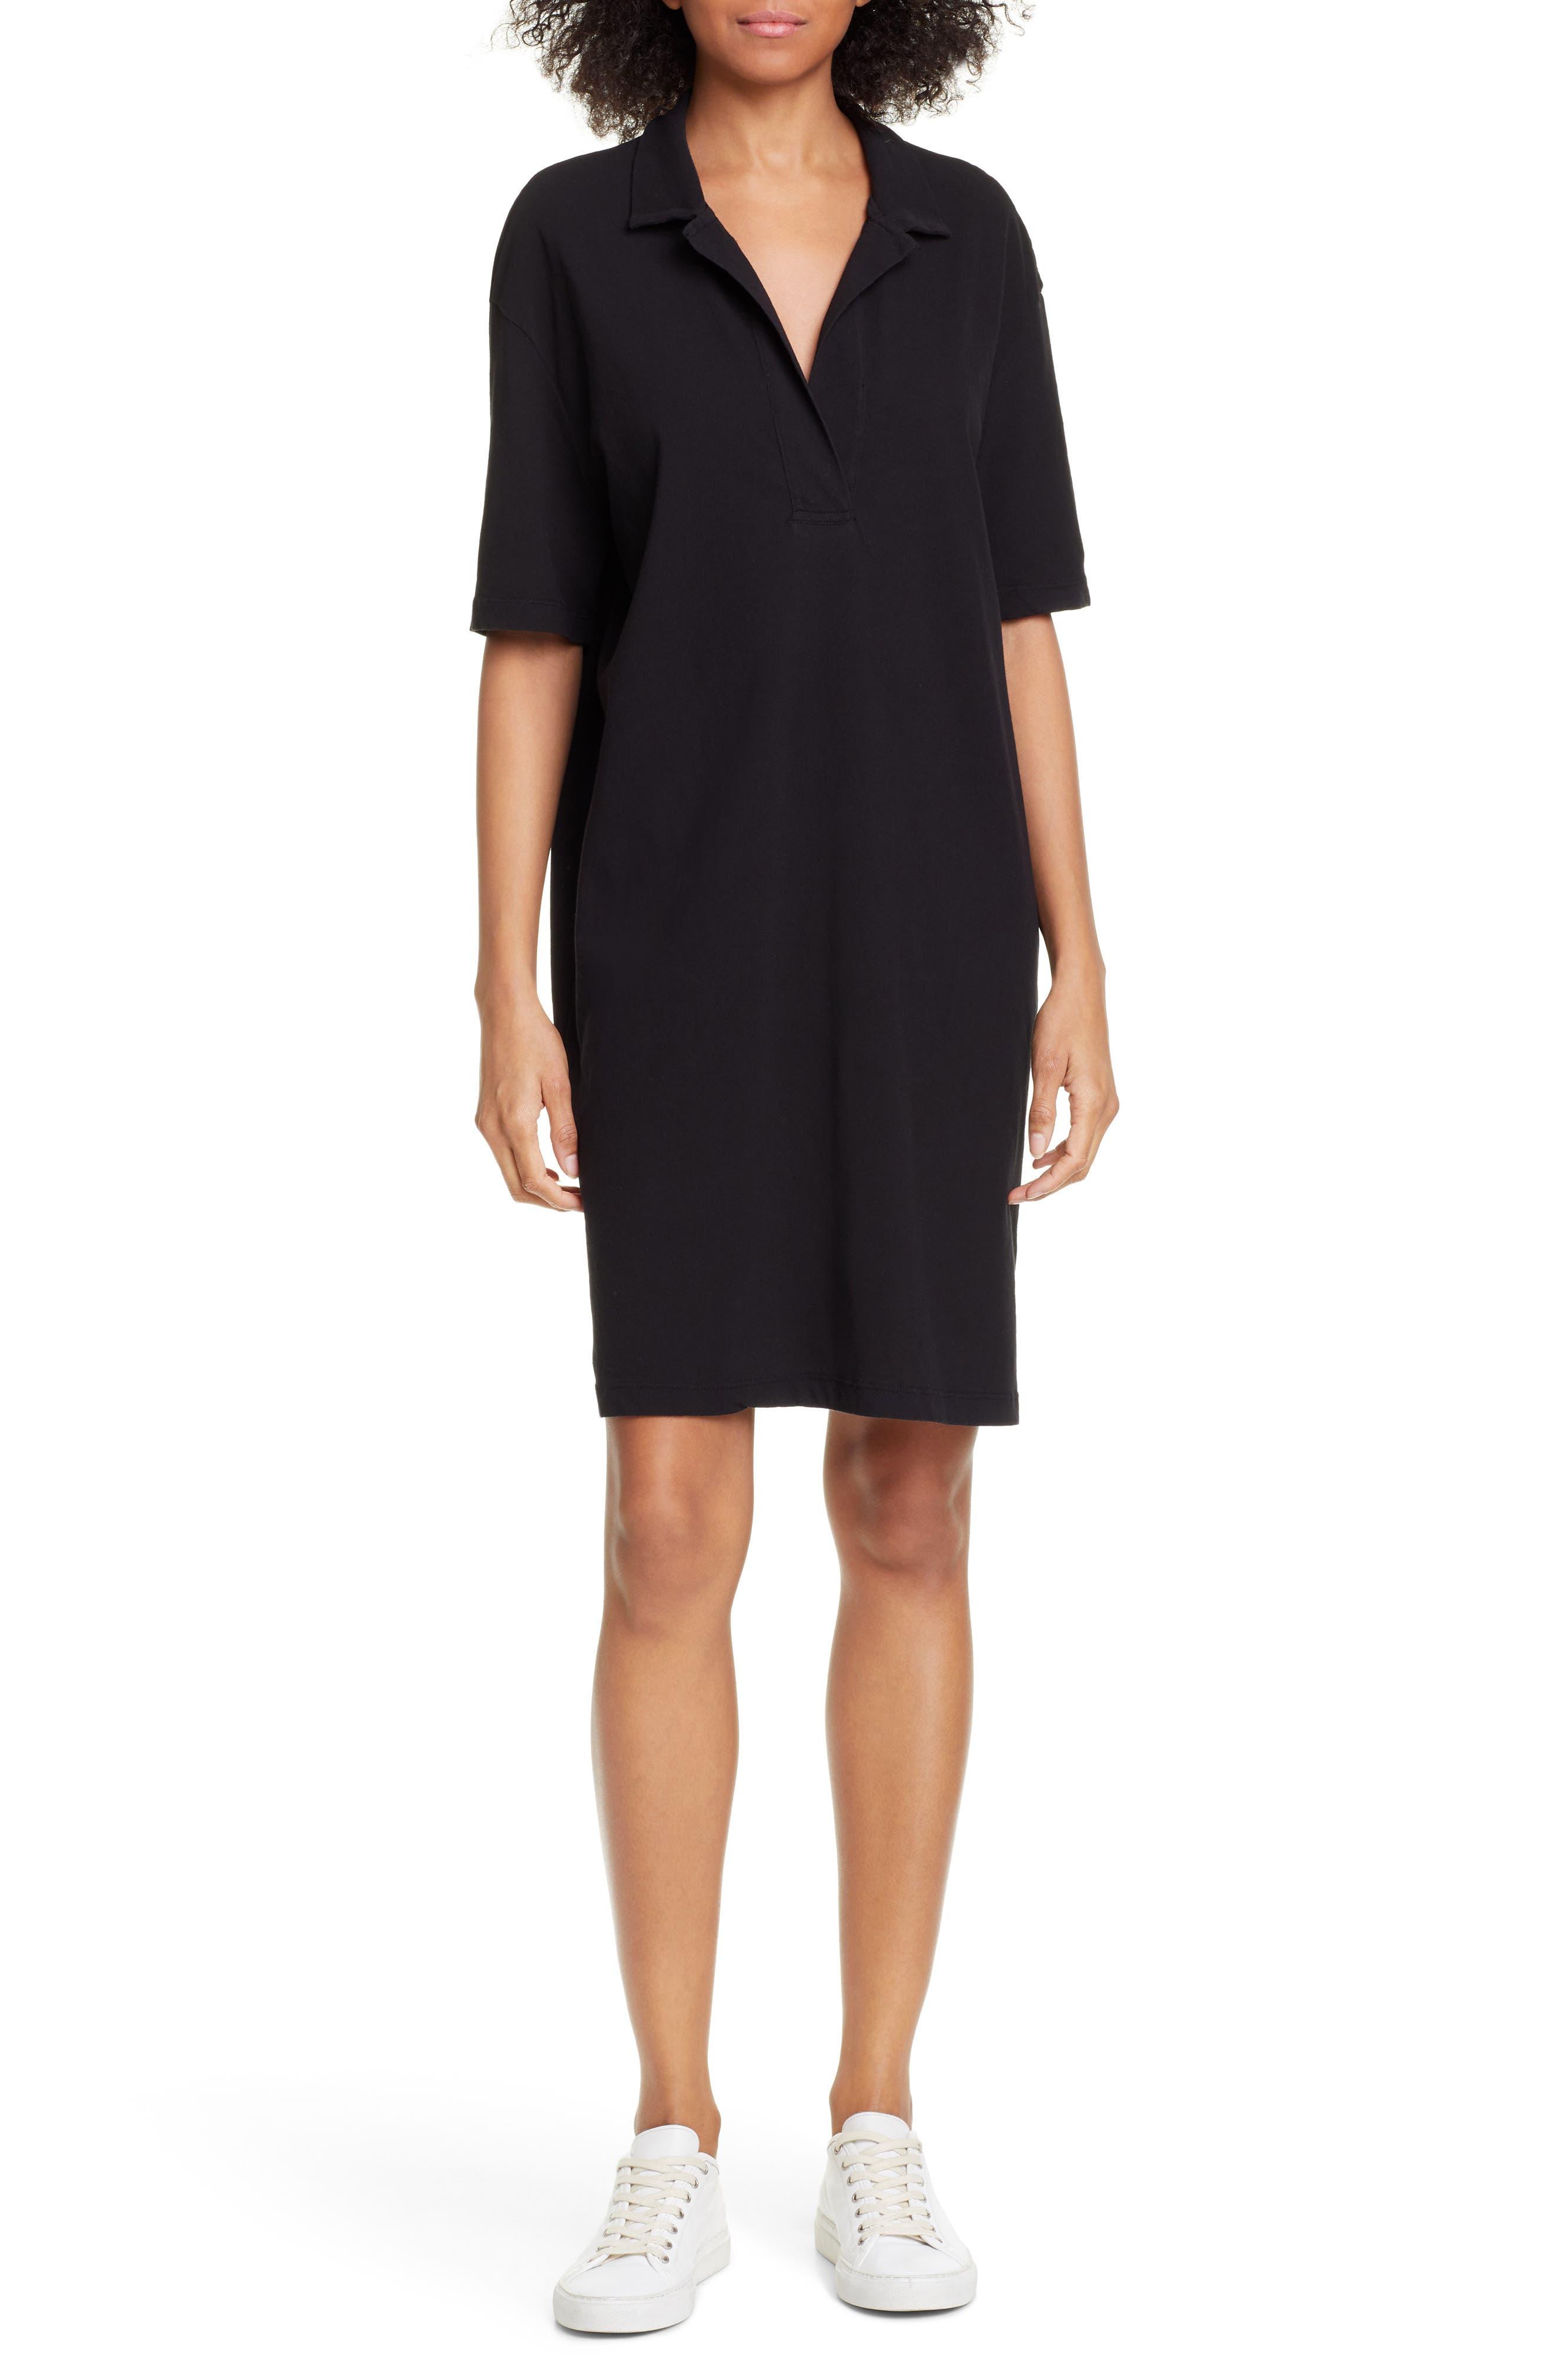 James Perse Oversize Polo Dress, Black